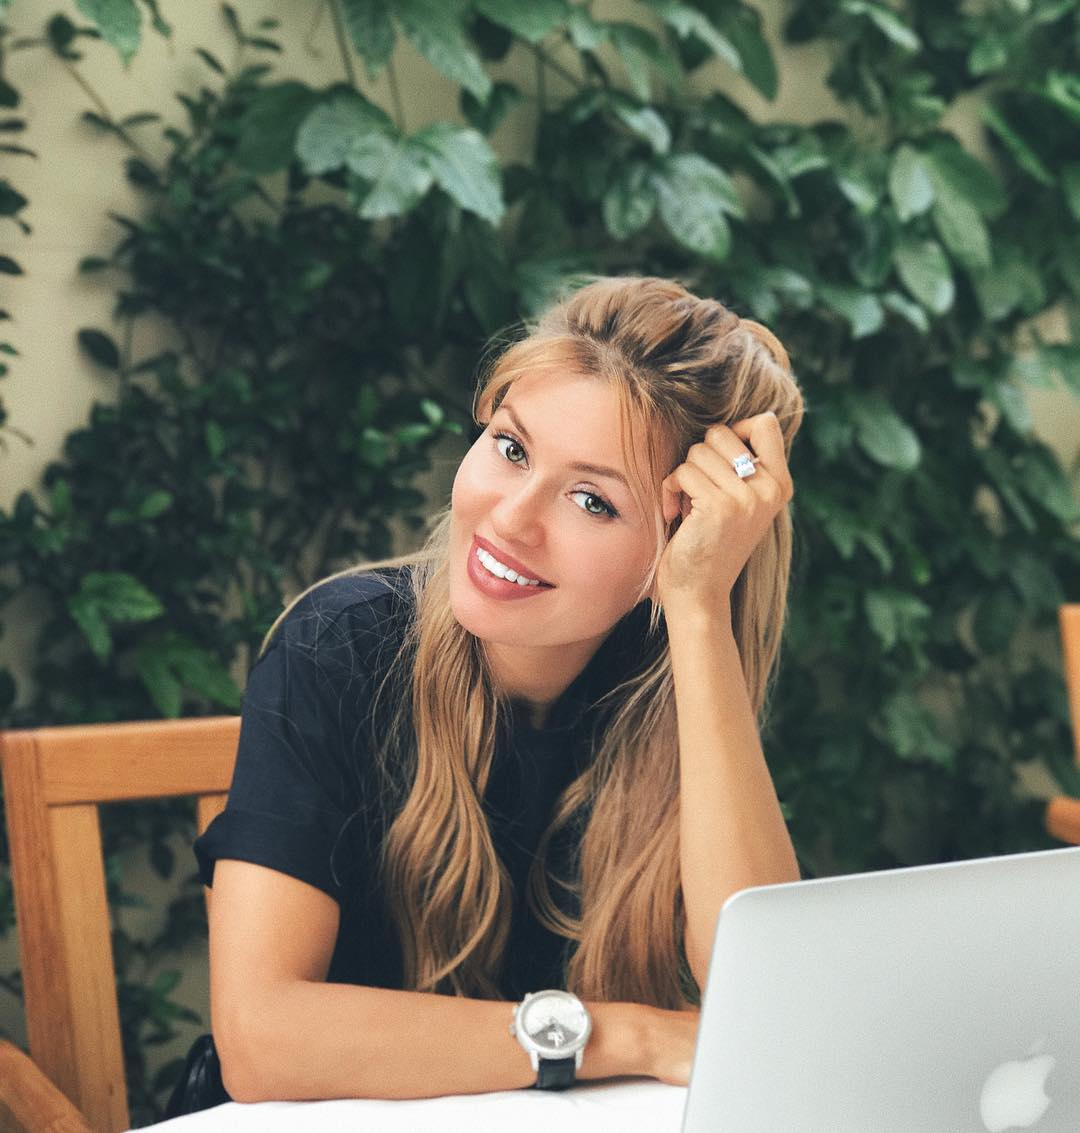 Виктория боня домашнее видео онлайн фото крупным